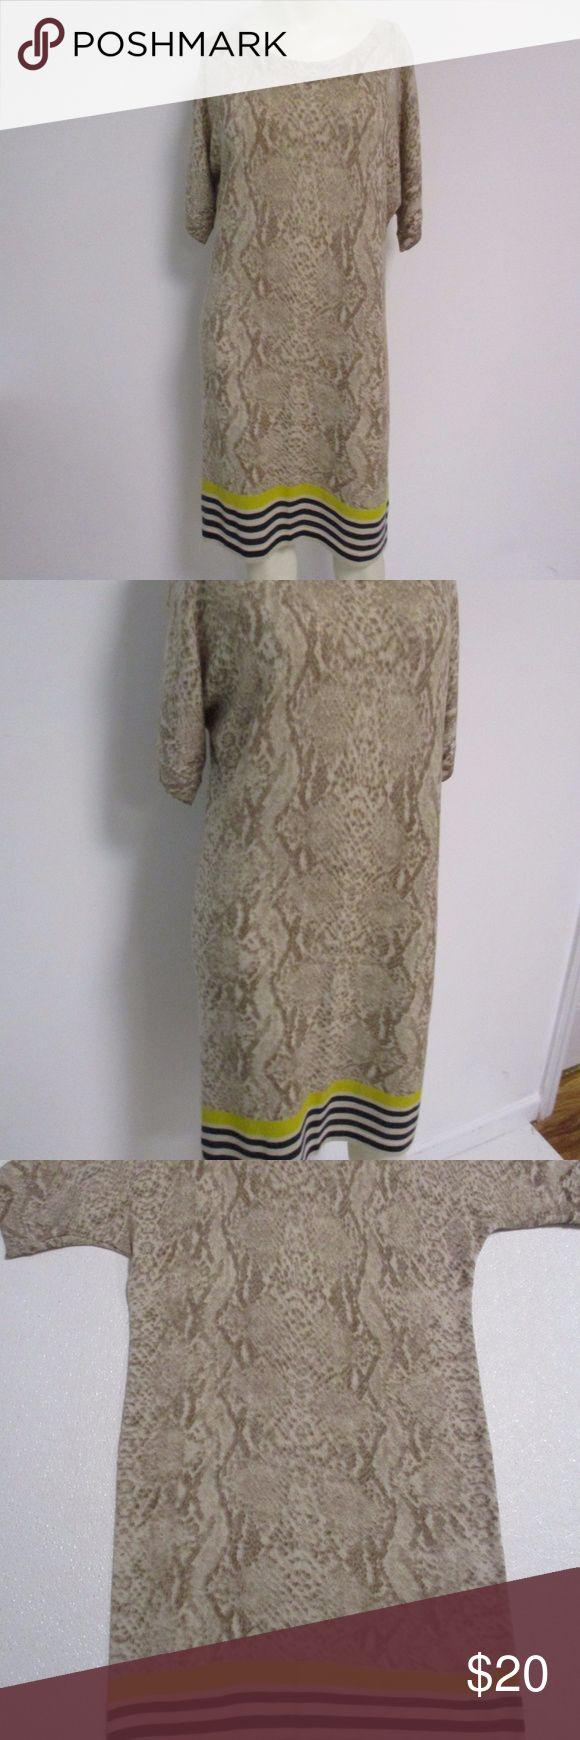 "Ann Taylor Loft Snake Stripe Wool Dress Medium Cute dress for fall from Ann Taylor Loft Size medium 100% wool Snake print with black, yellow and tan stripe at the hem Very good condition Bust- 17-20"" laid flat Waist- 35"" Hips- 40-42"" Length-37"" Ann Taylor Loft Dresses"